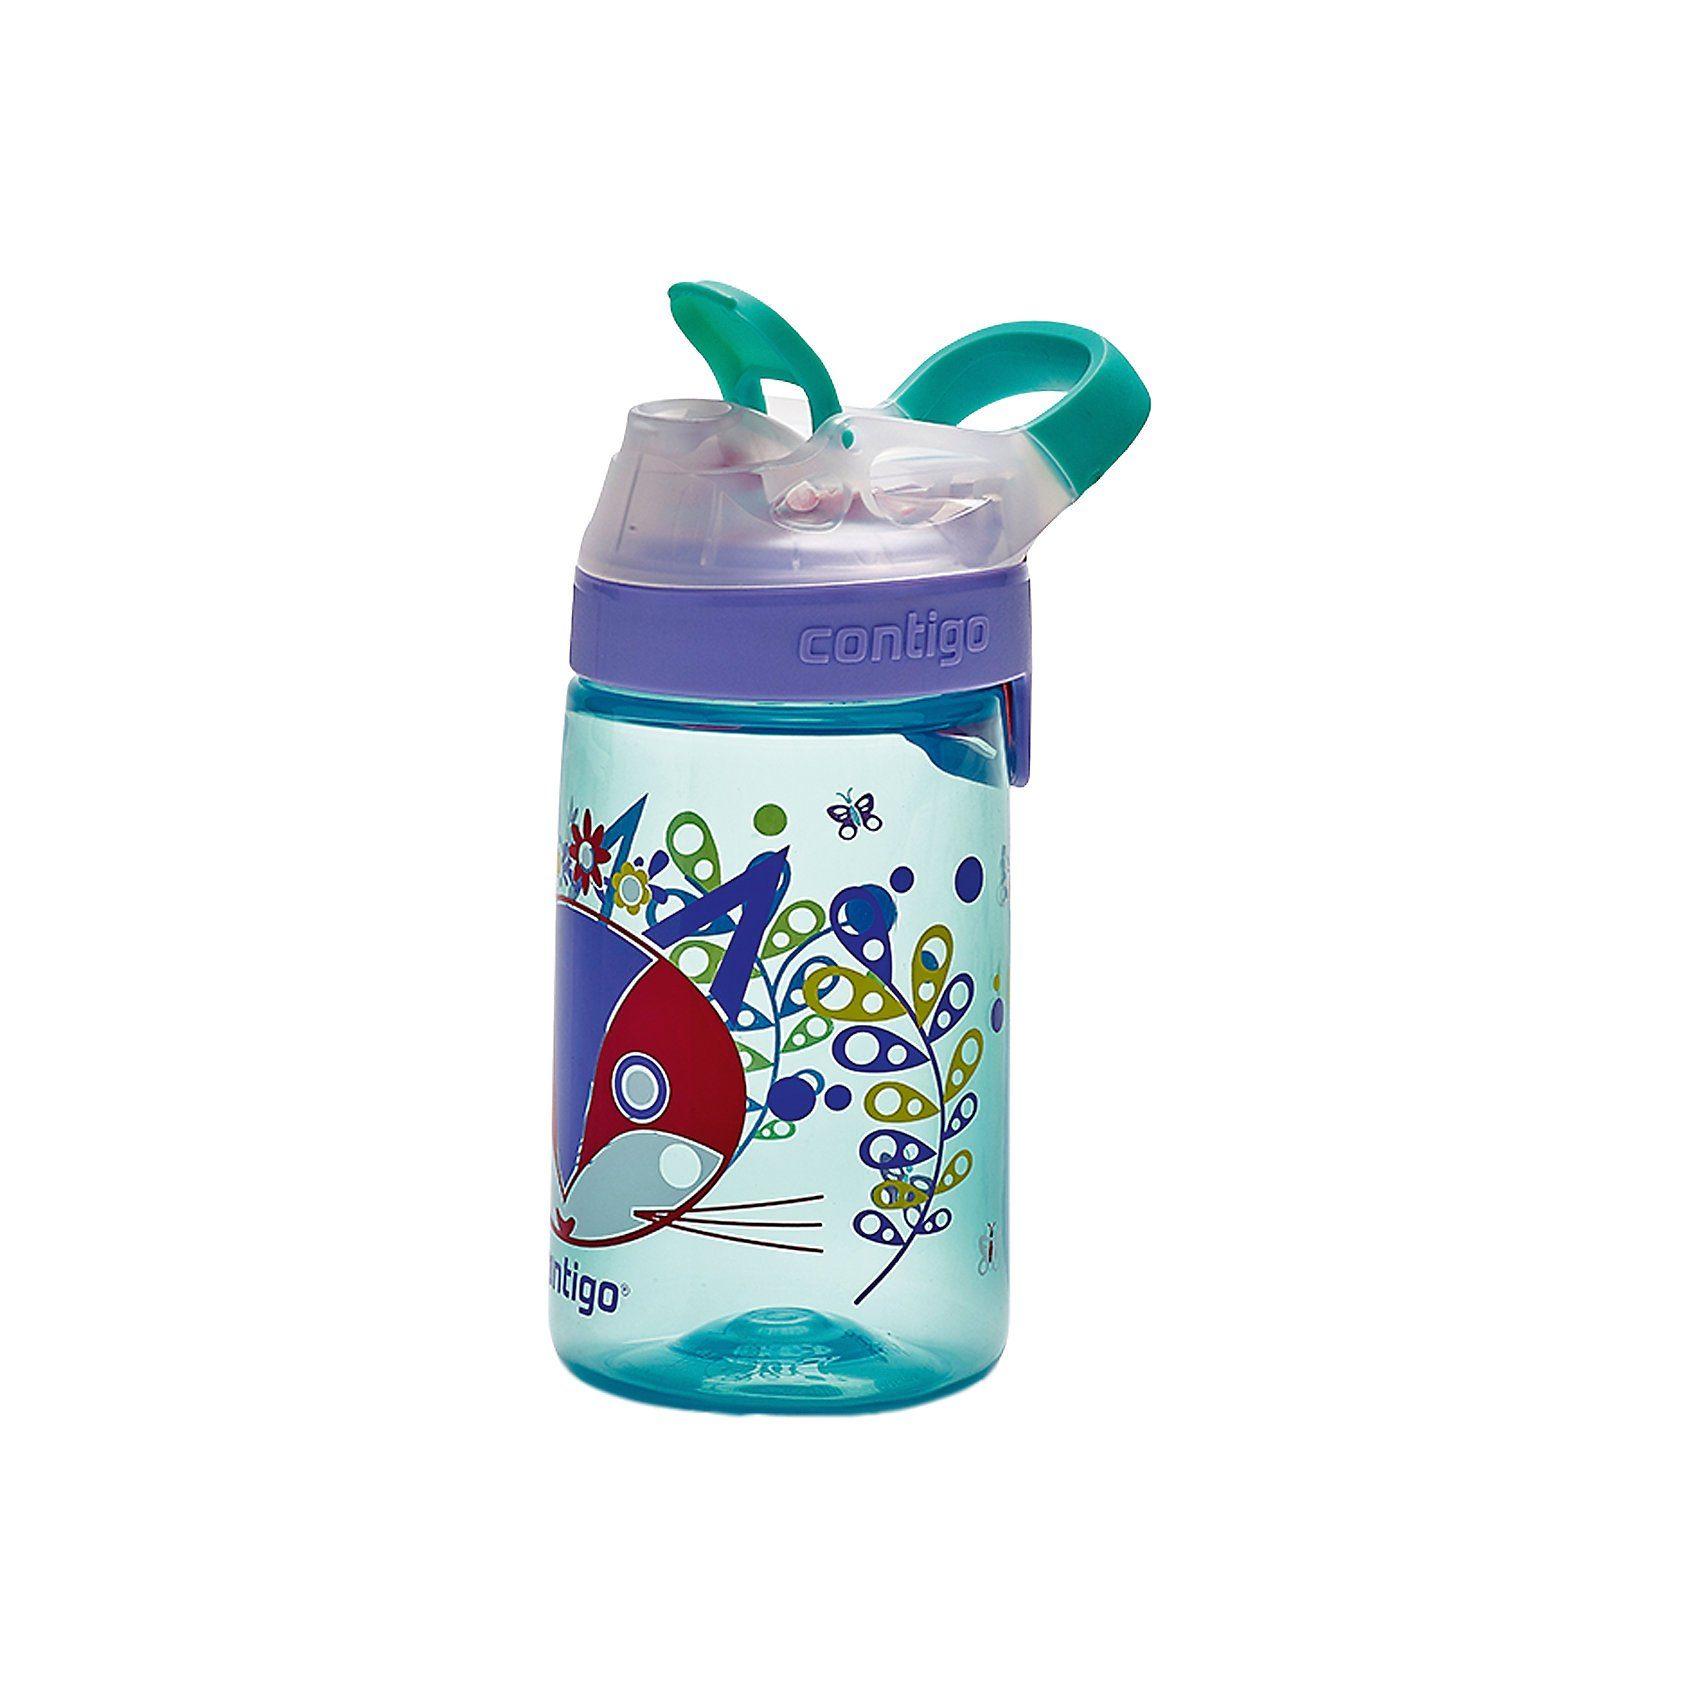 contigo Trinkflasche Gizmo Sip Ultramarine Purrfect, 420 ml